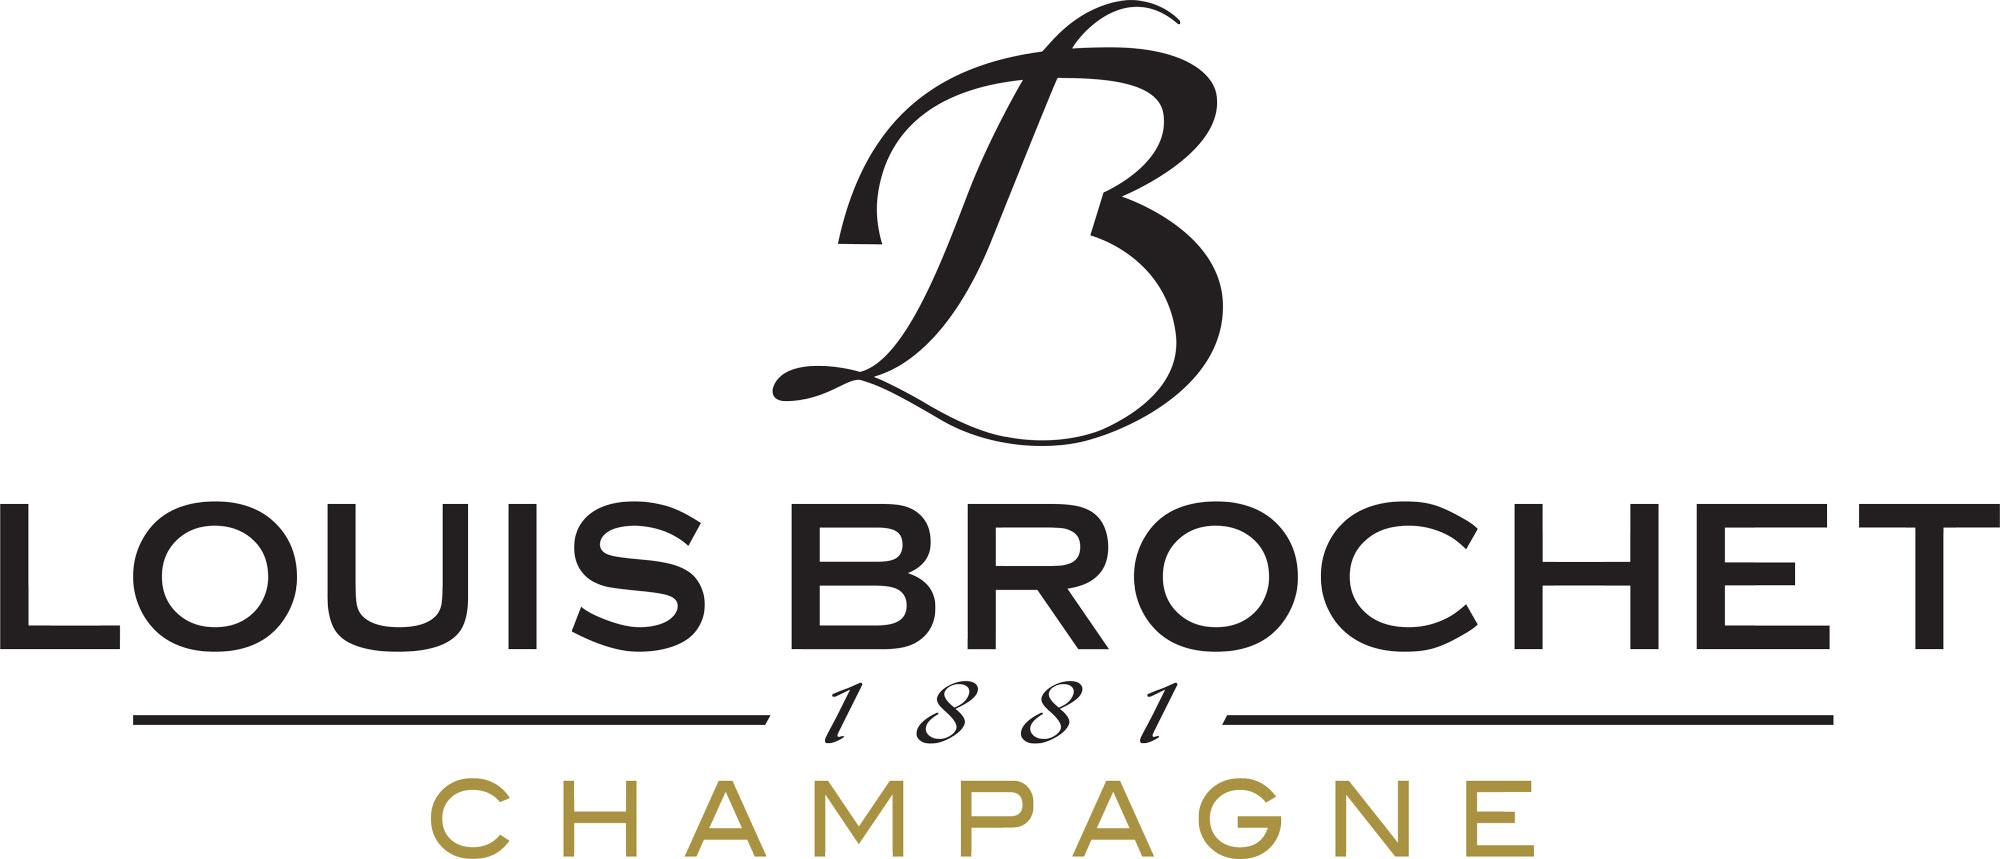 Louis Brochet Champagne